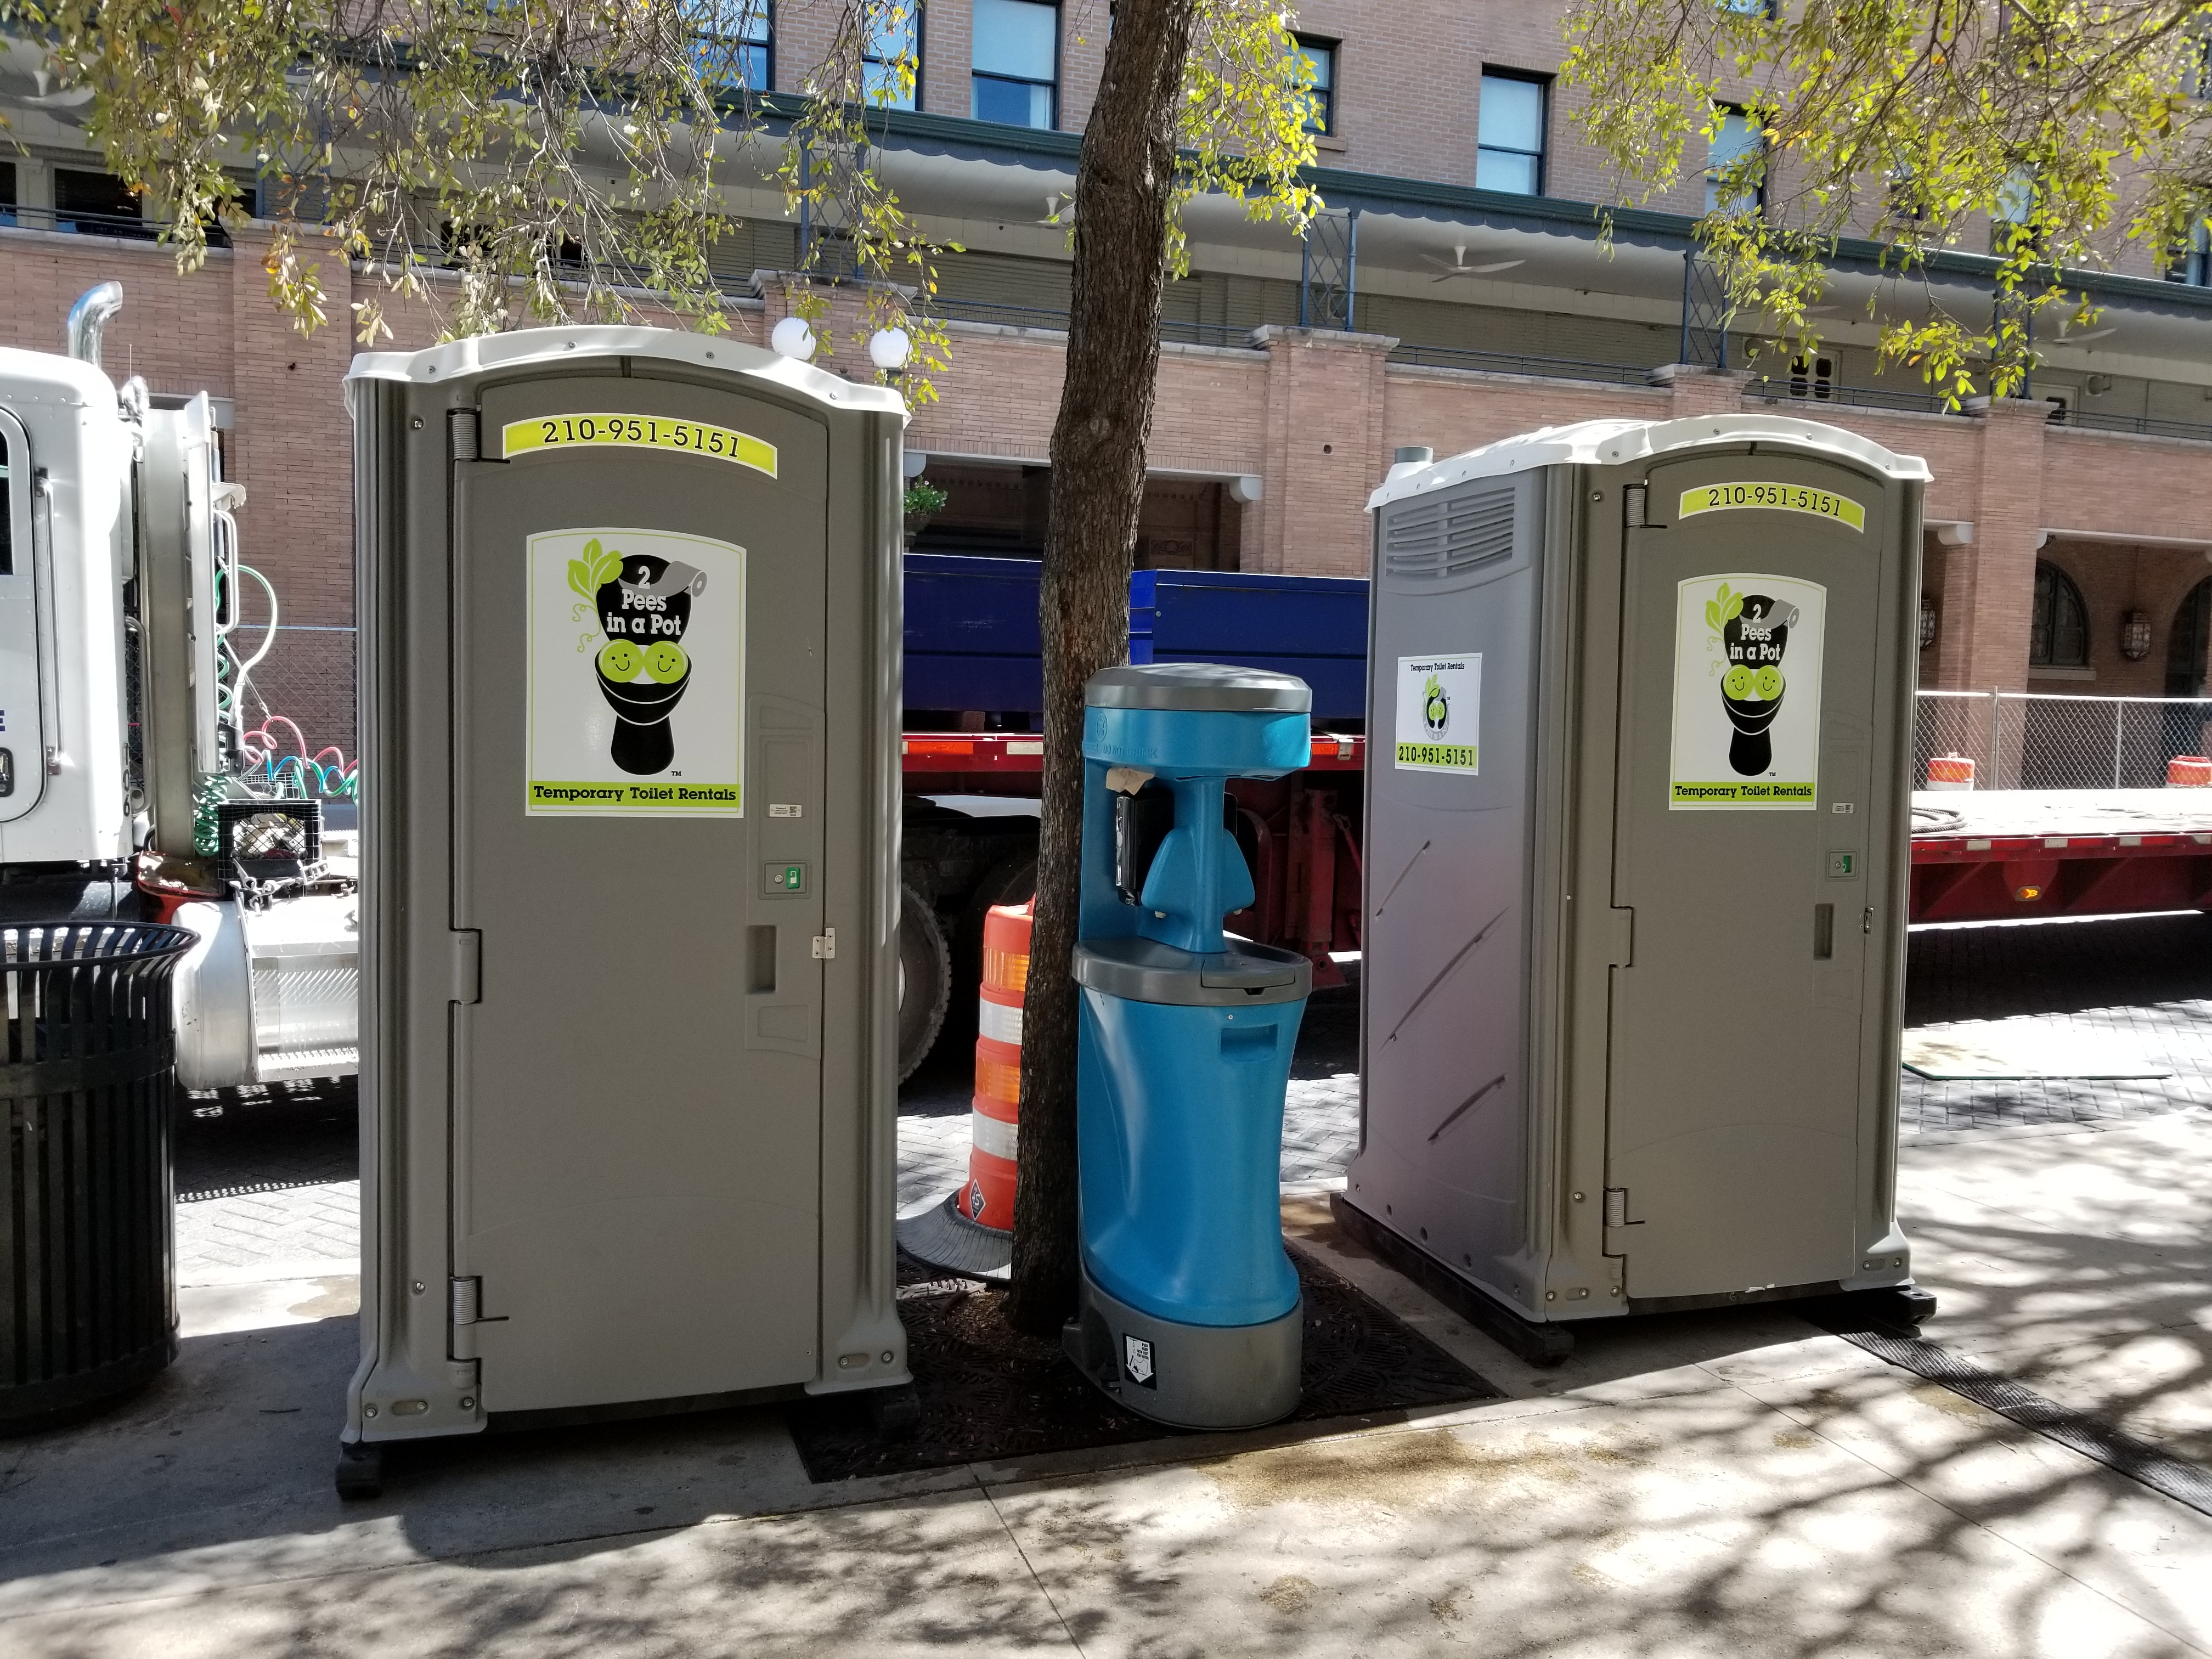 temporary toilet rentals